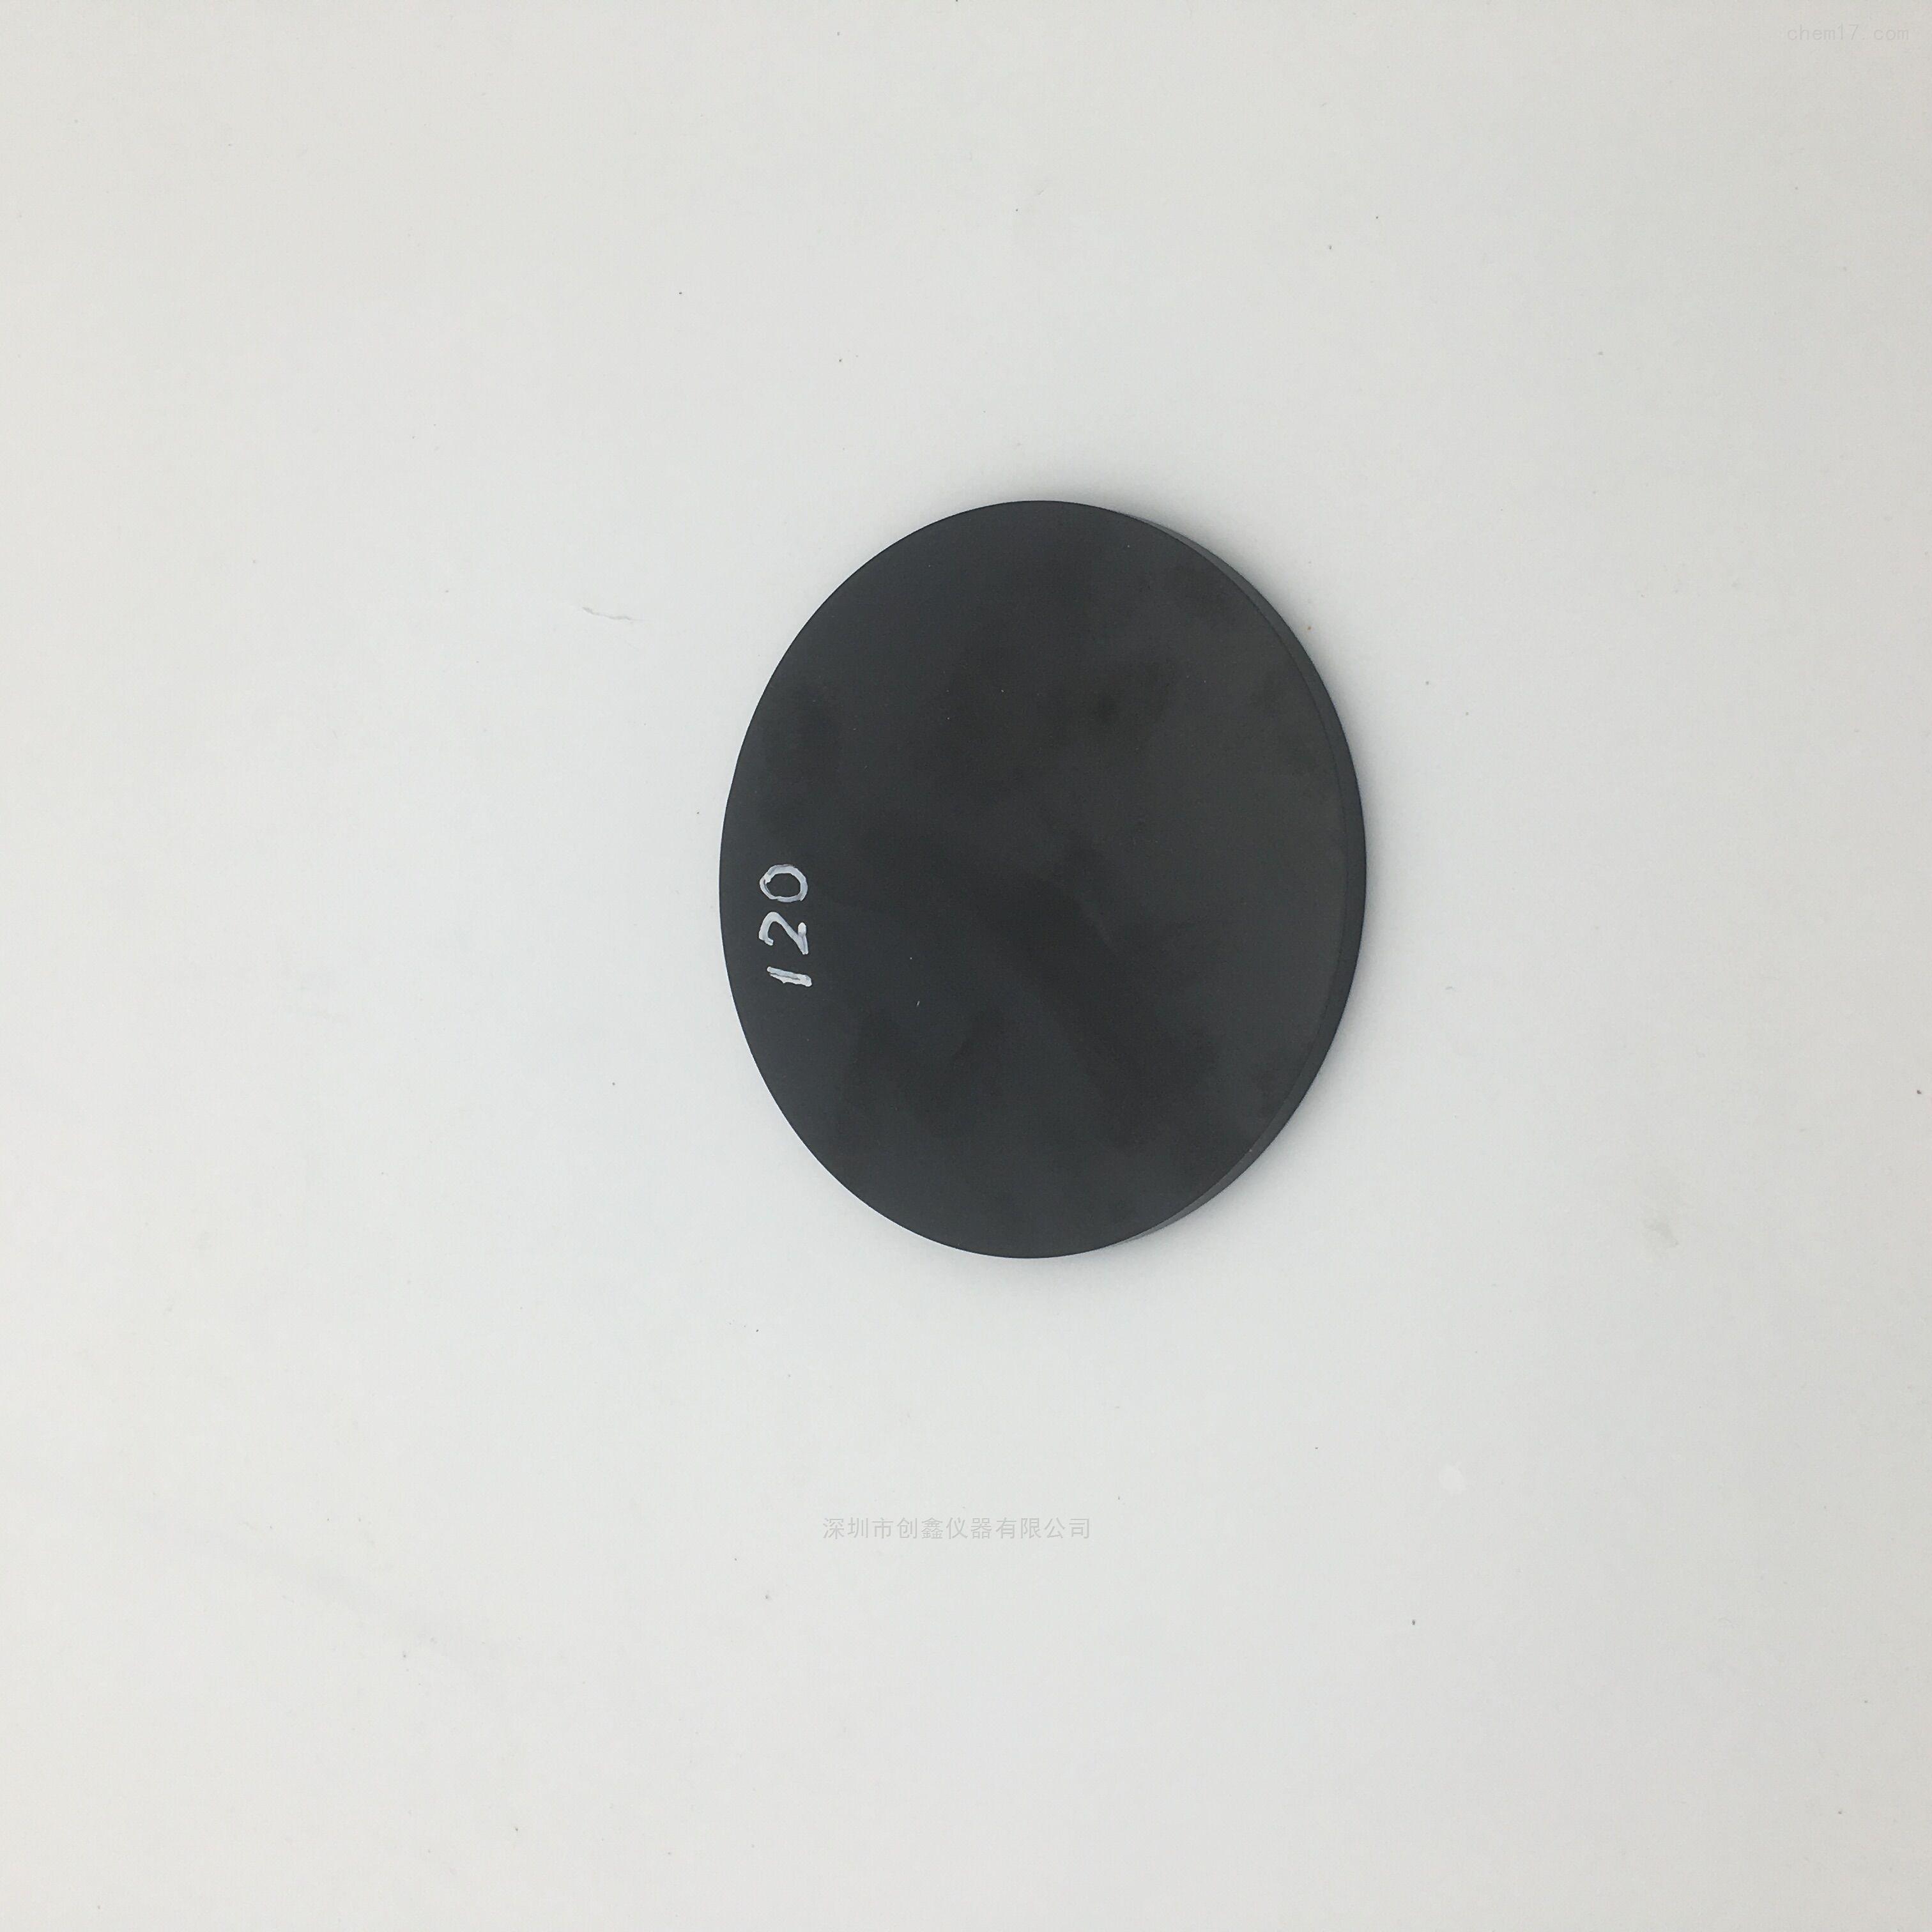 GB4706.14電磁爐標準鋼盤